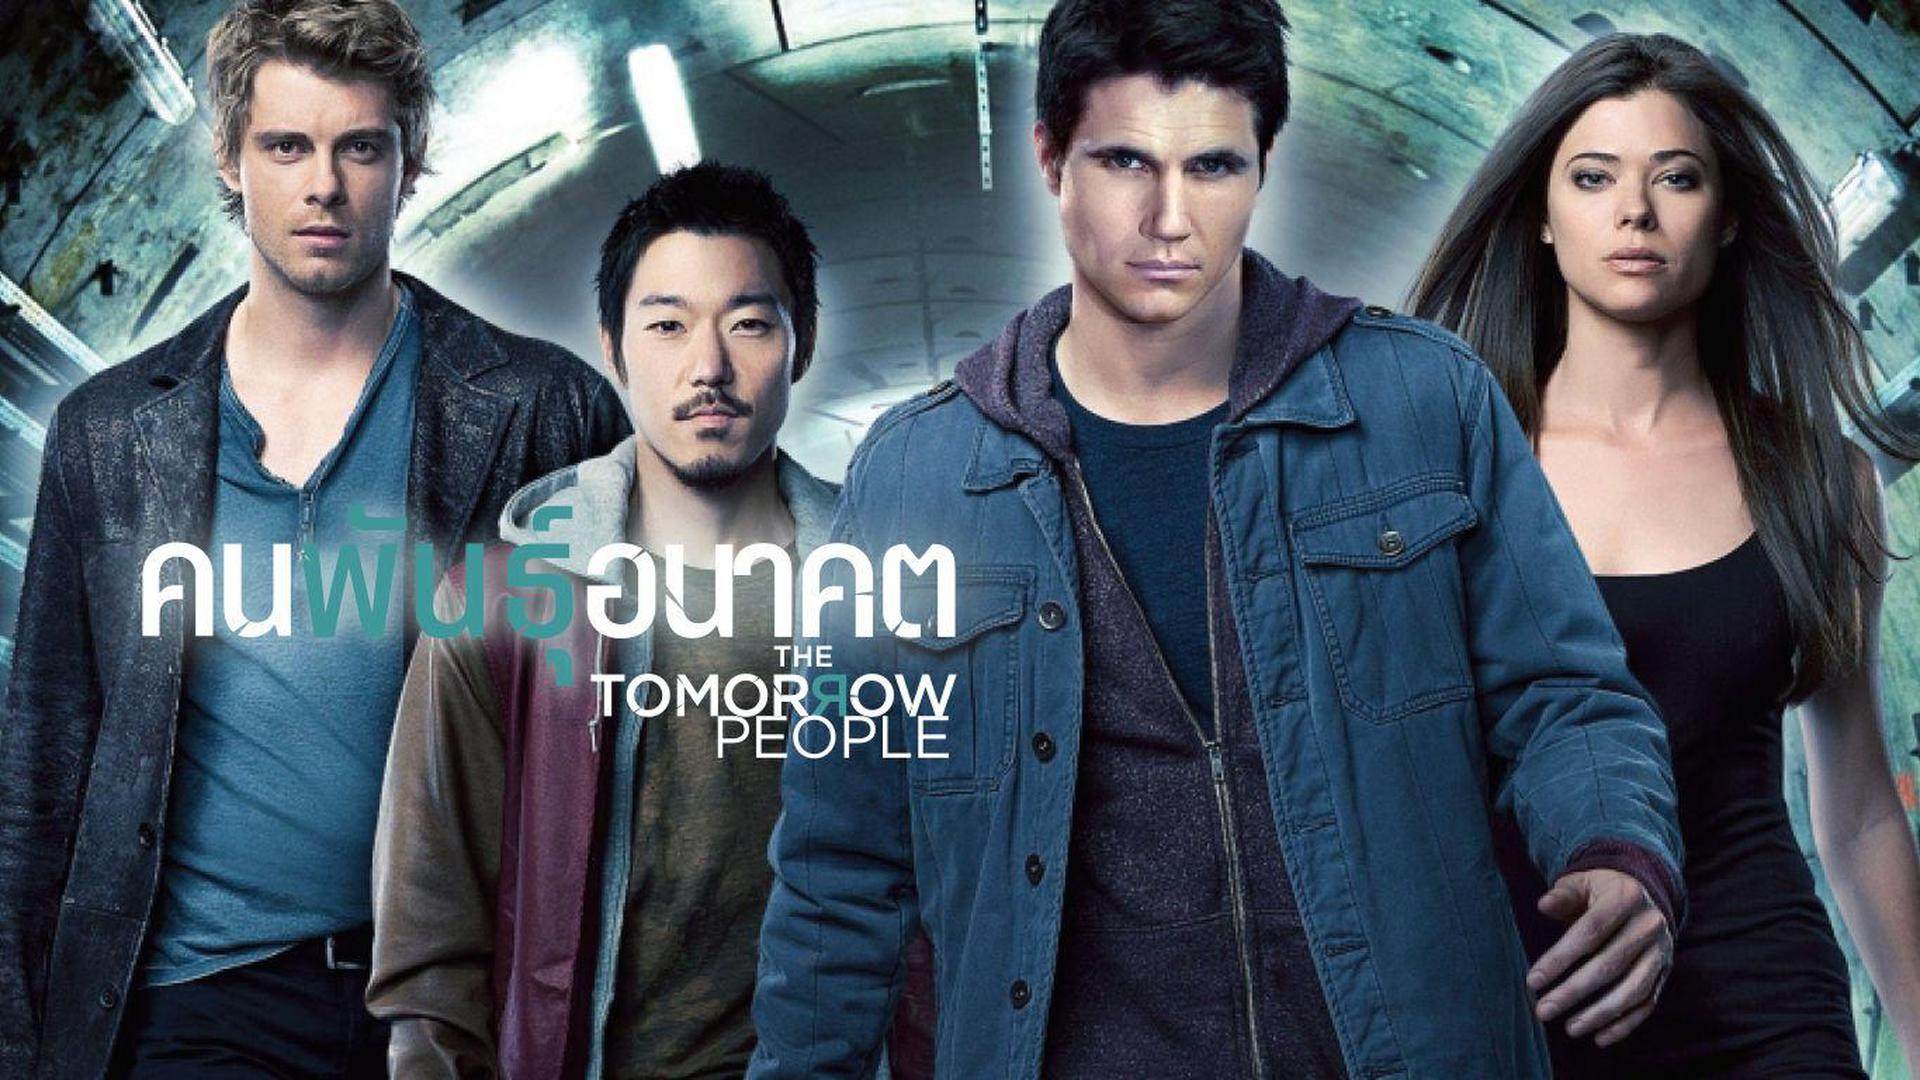 The Tomorrow People คนพันธุ์อนาคต